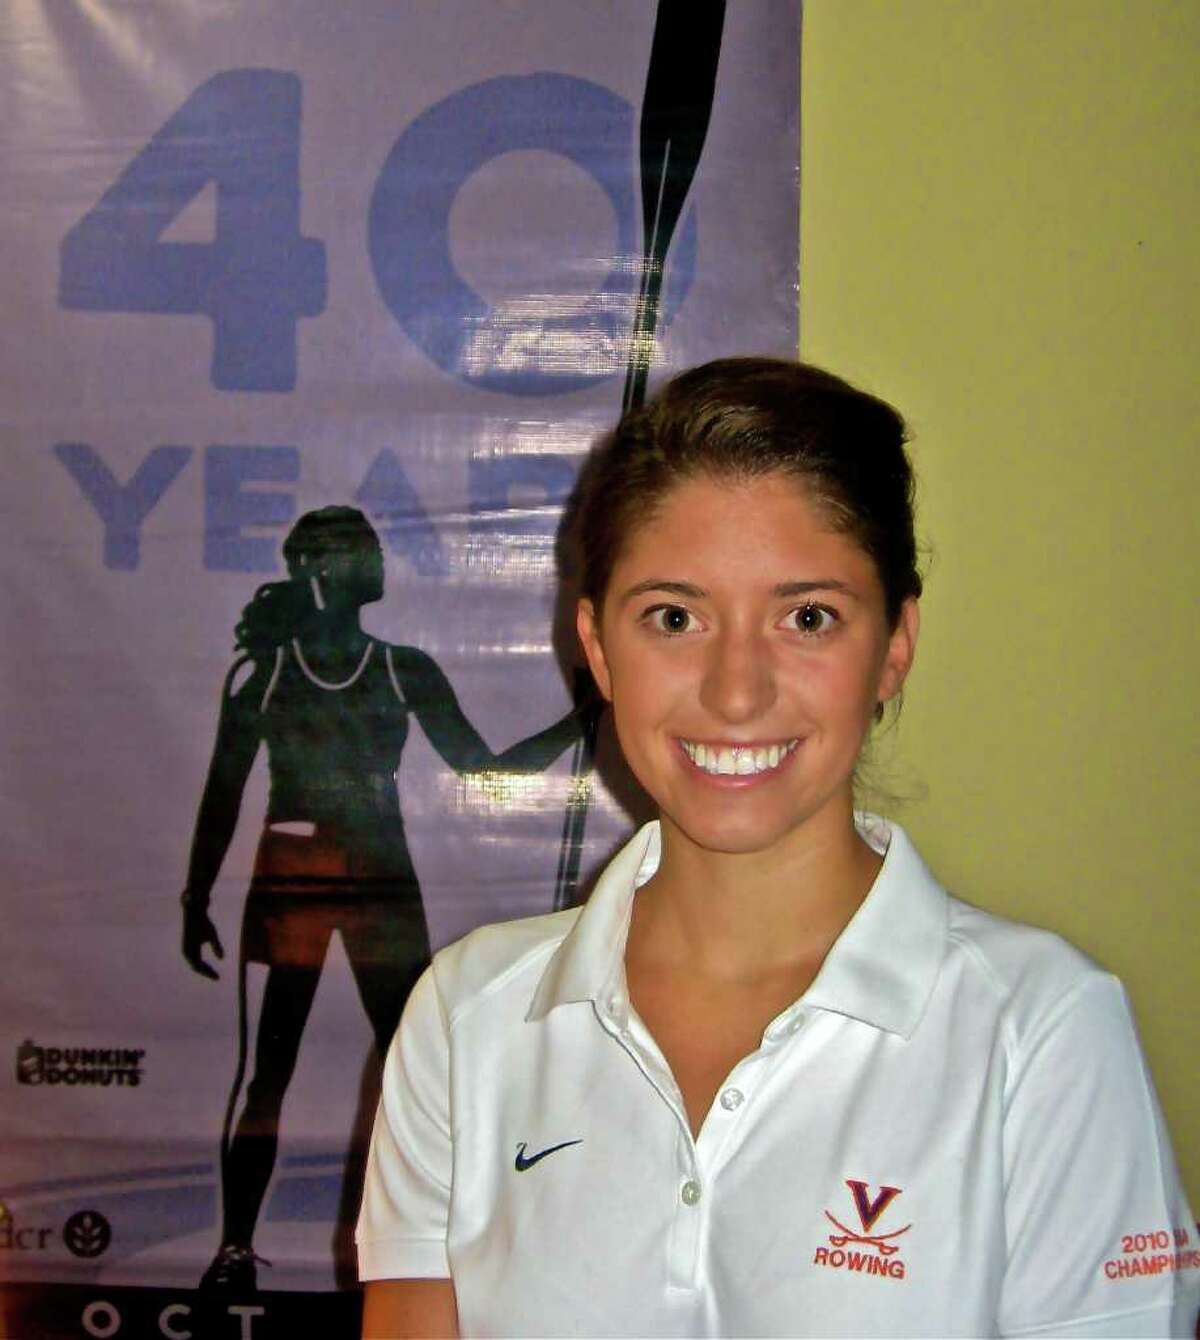 Greenwich's Cristine Candland helped lead the Virginia rowing to an NCAA championship last season.